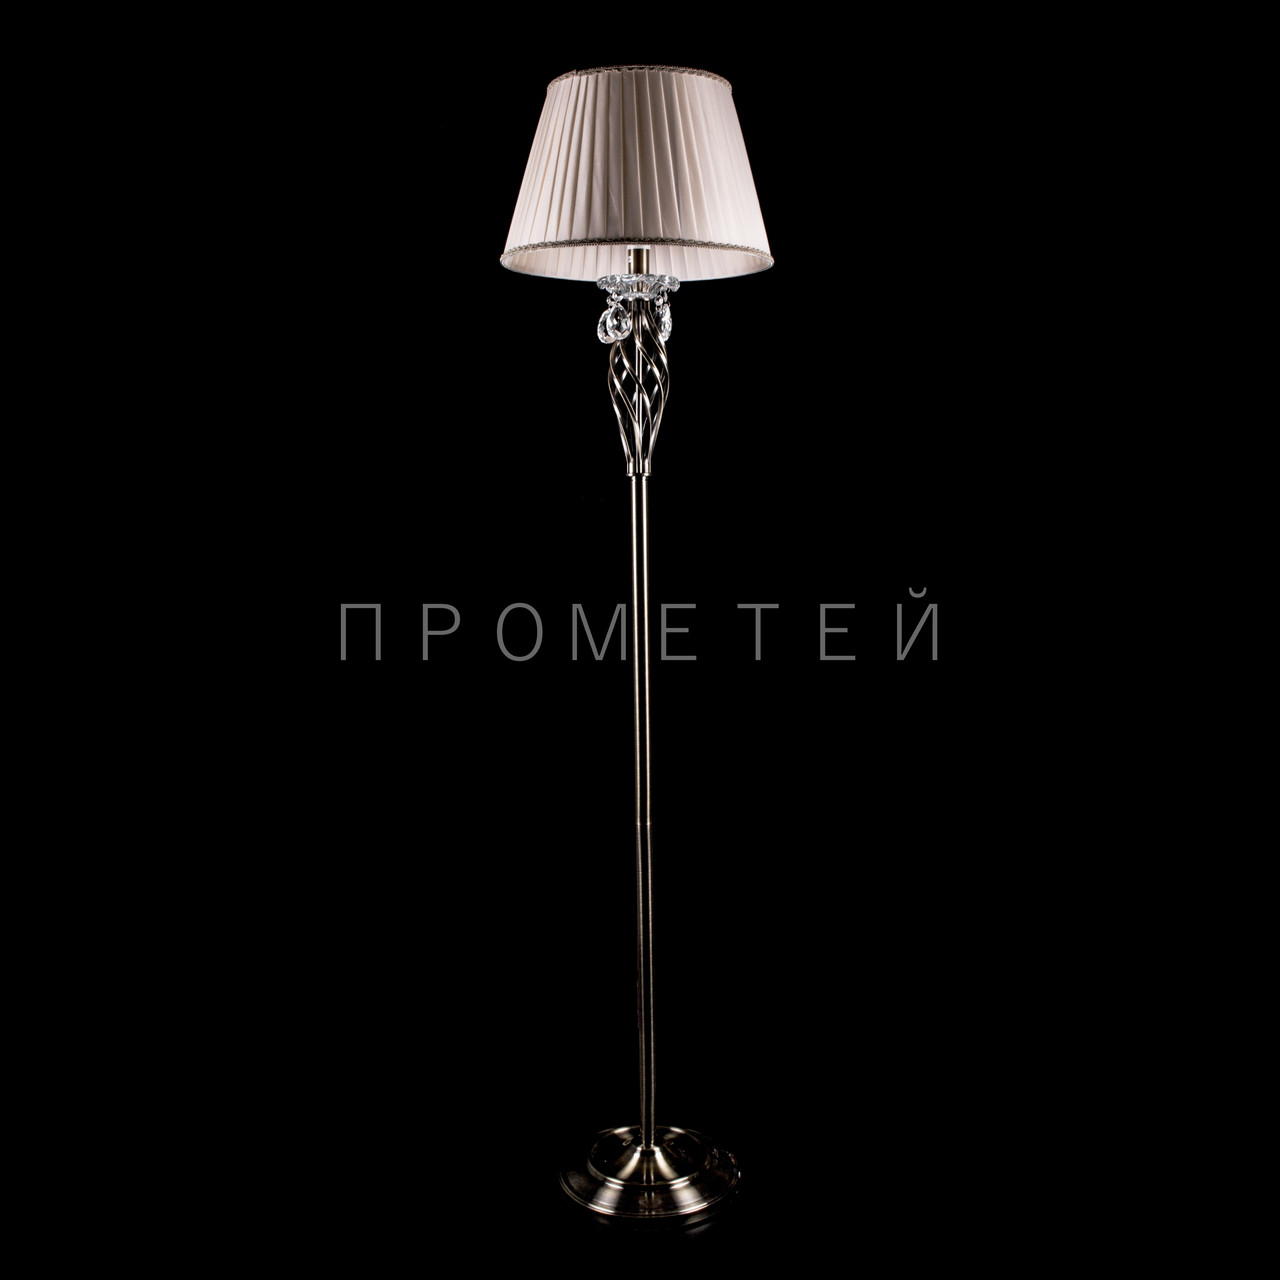 Торшер с абажуром на 1 лампочку P13-RM1001/1F/AB